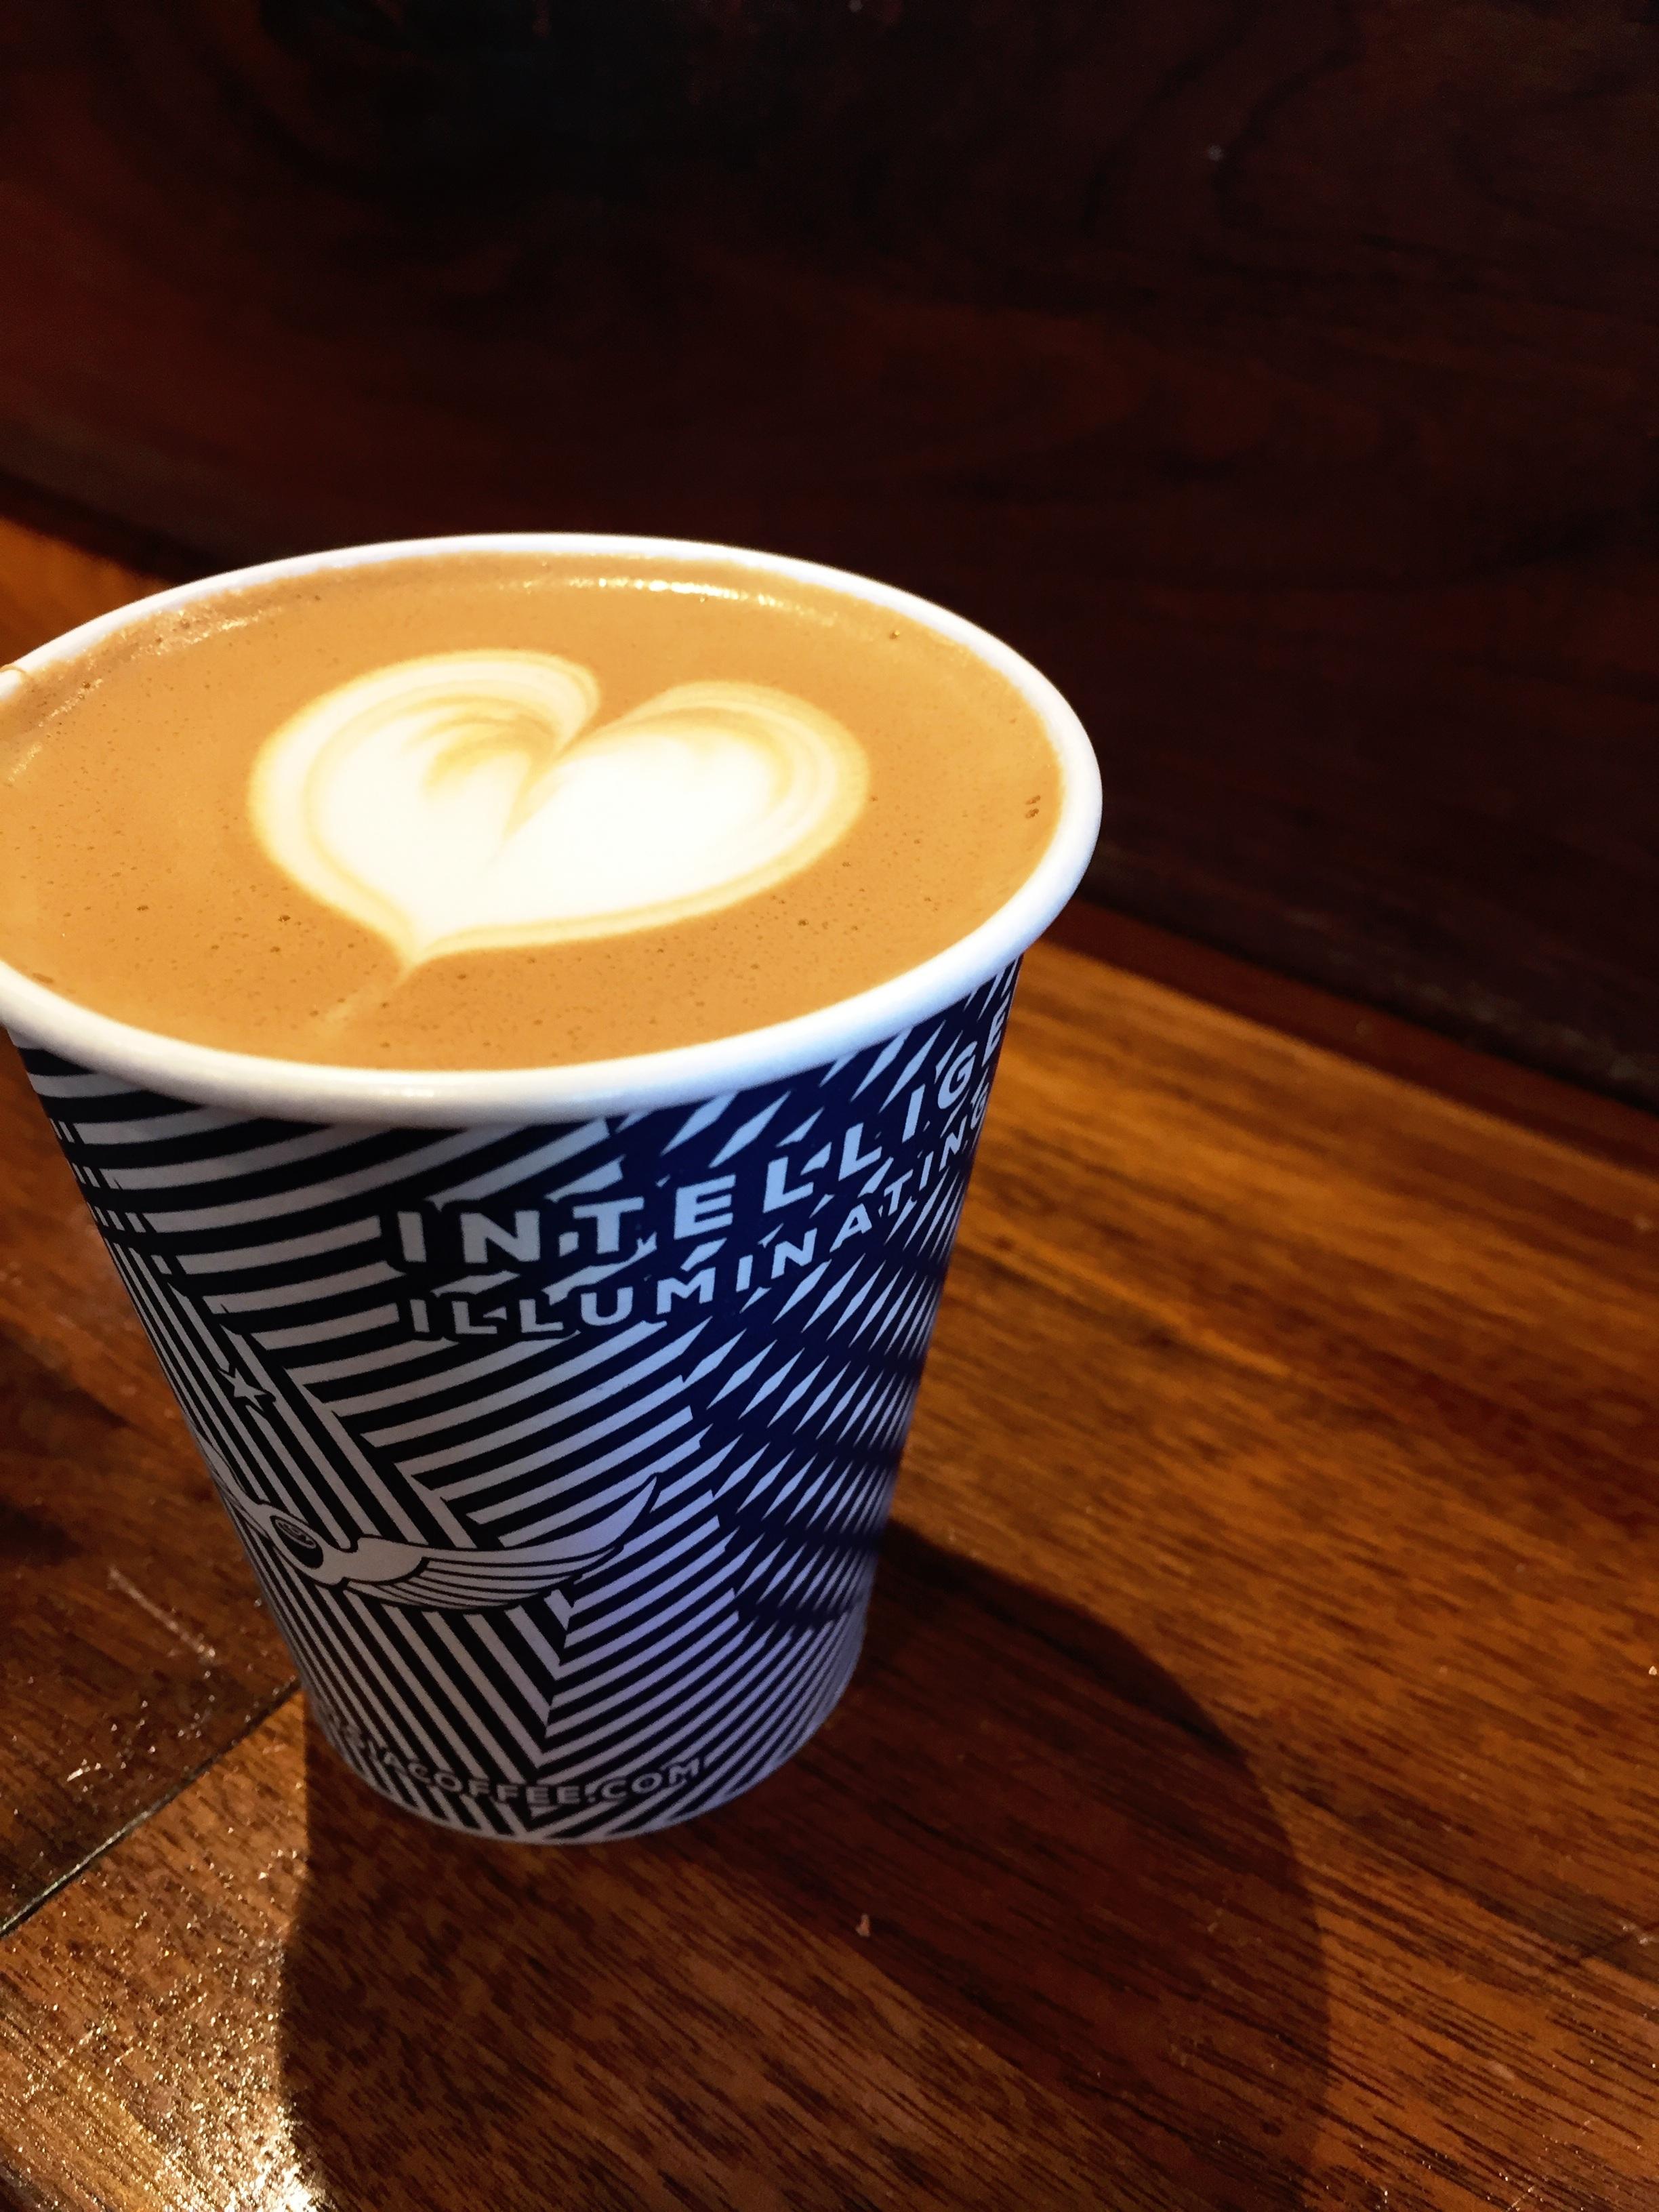 Cappuccino from Intelligentsia Coffee, Chicago